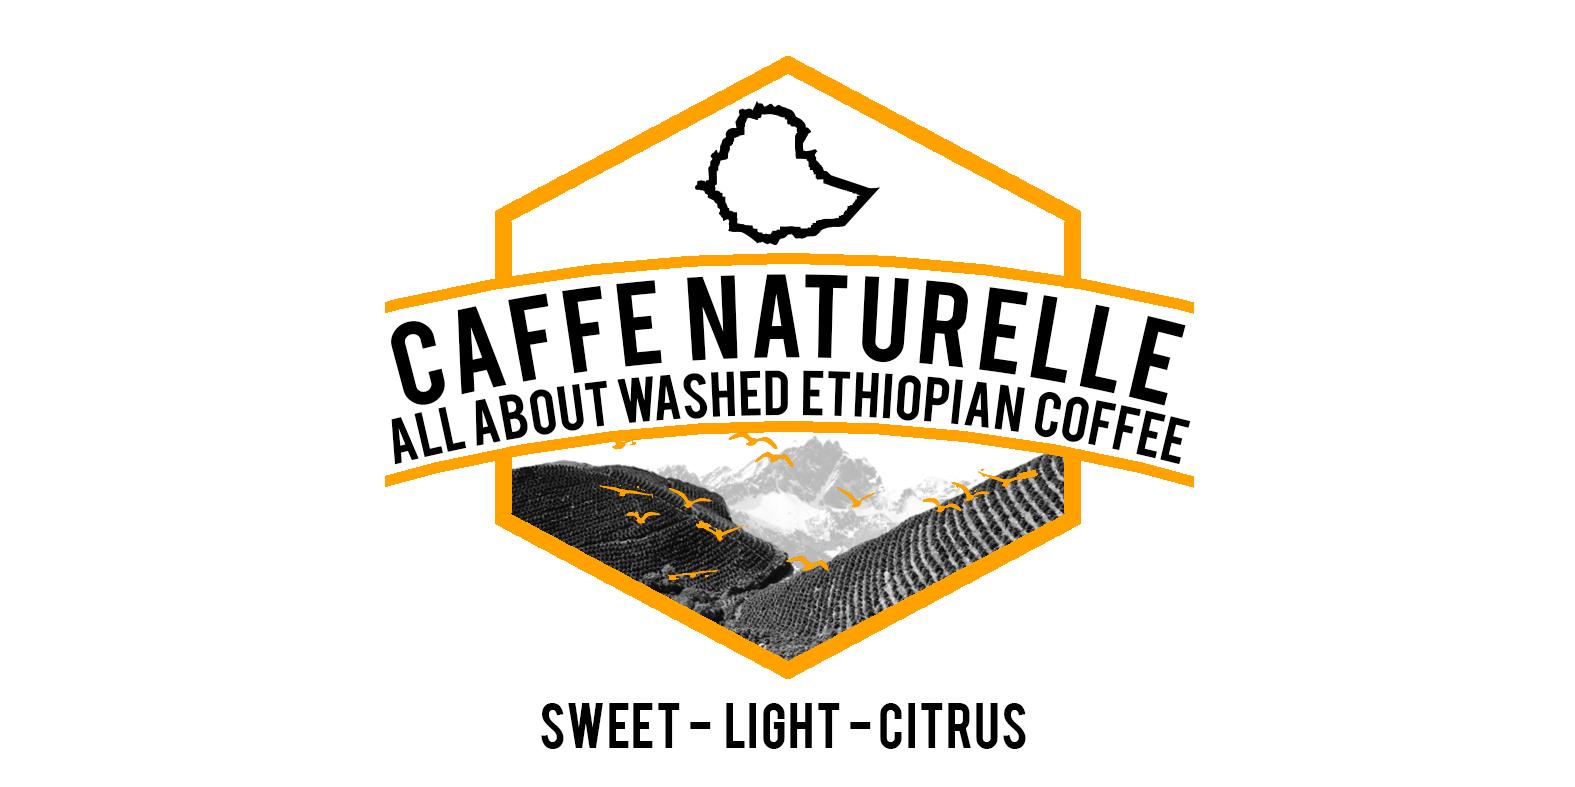 CAFFE NATURELLE ESPRESSO BLEND